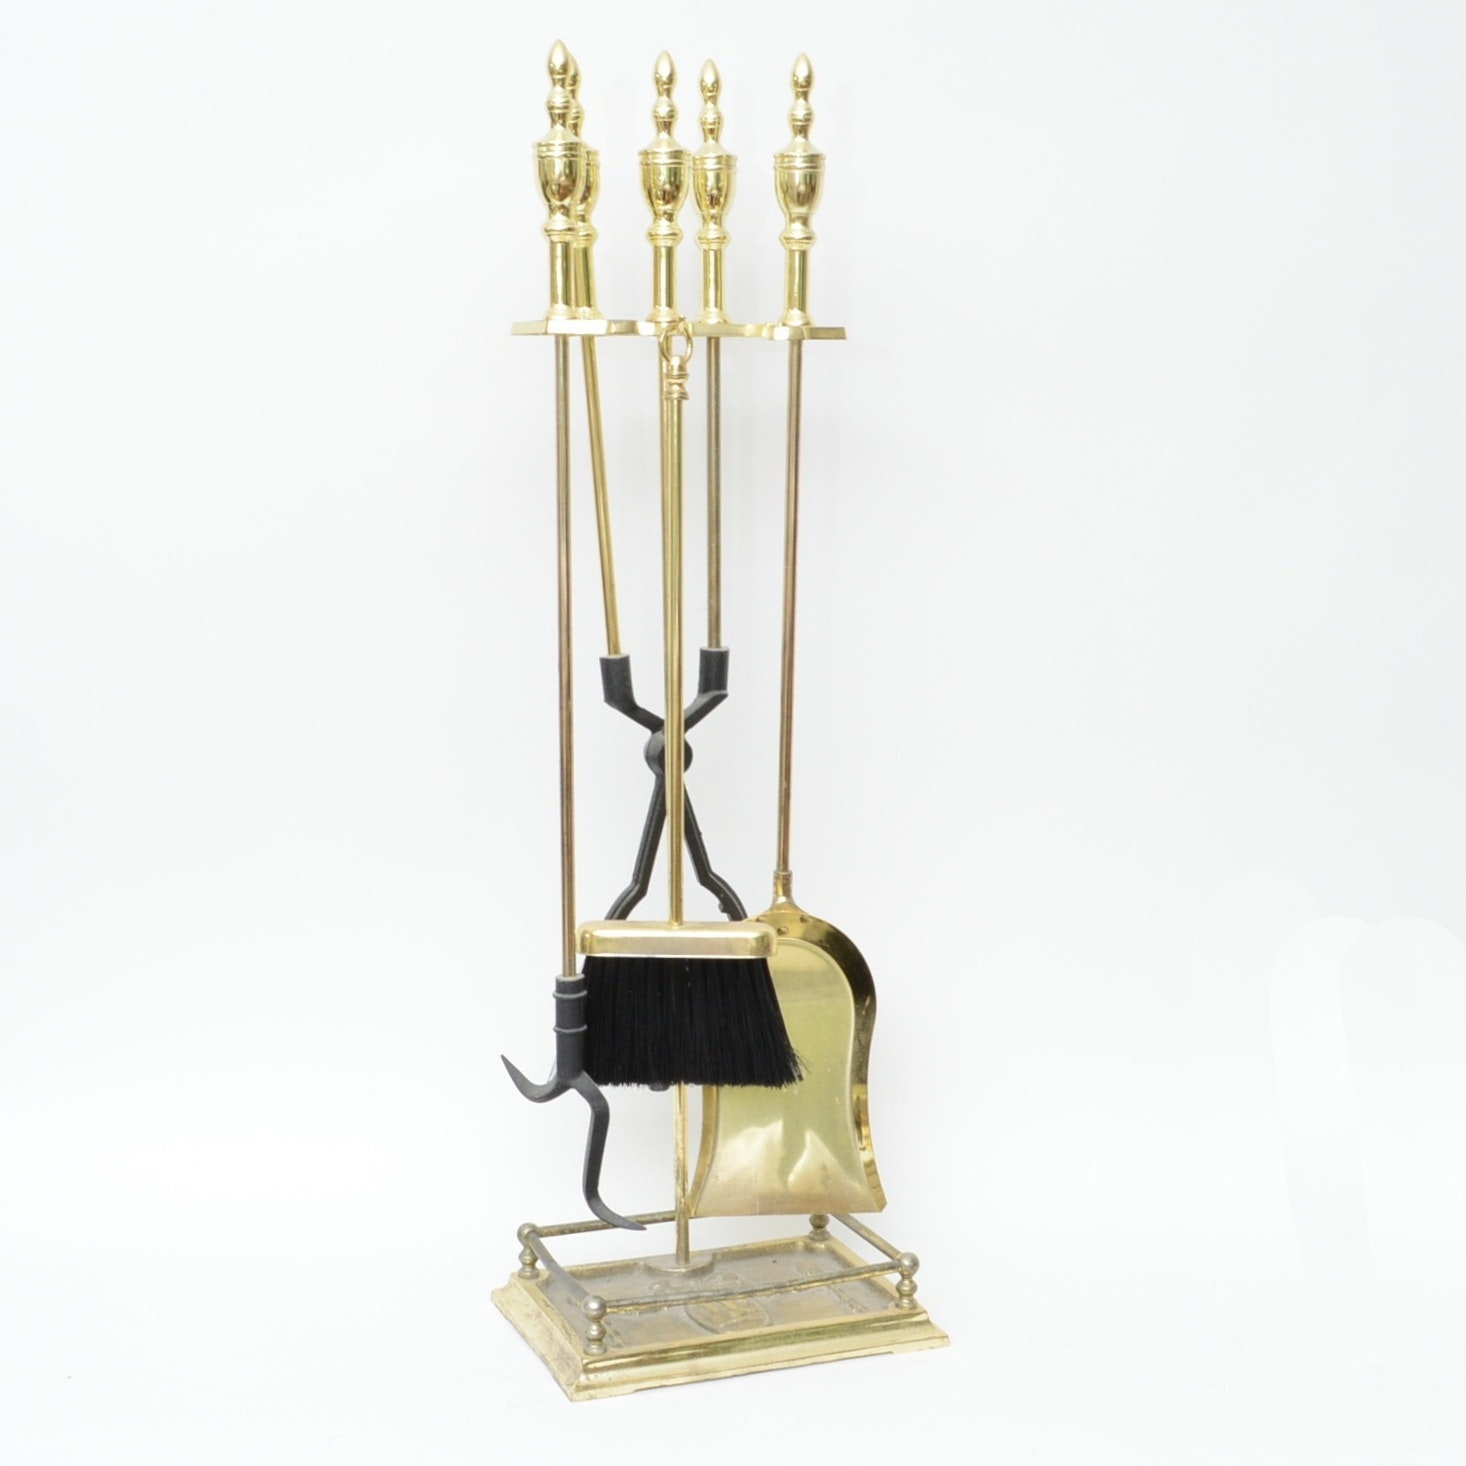 Brass Fireplace Tool Set